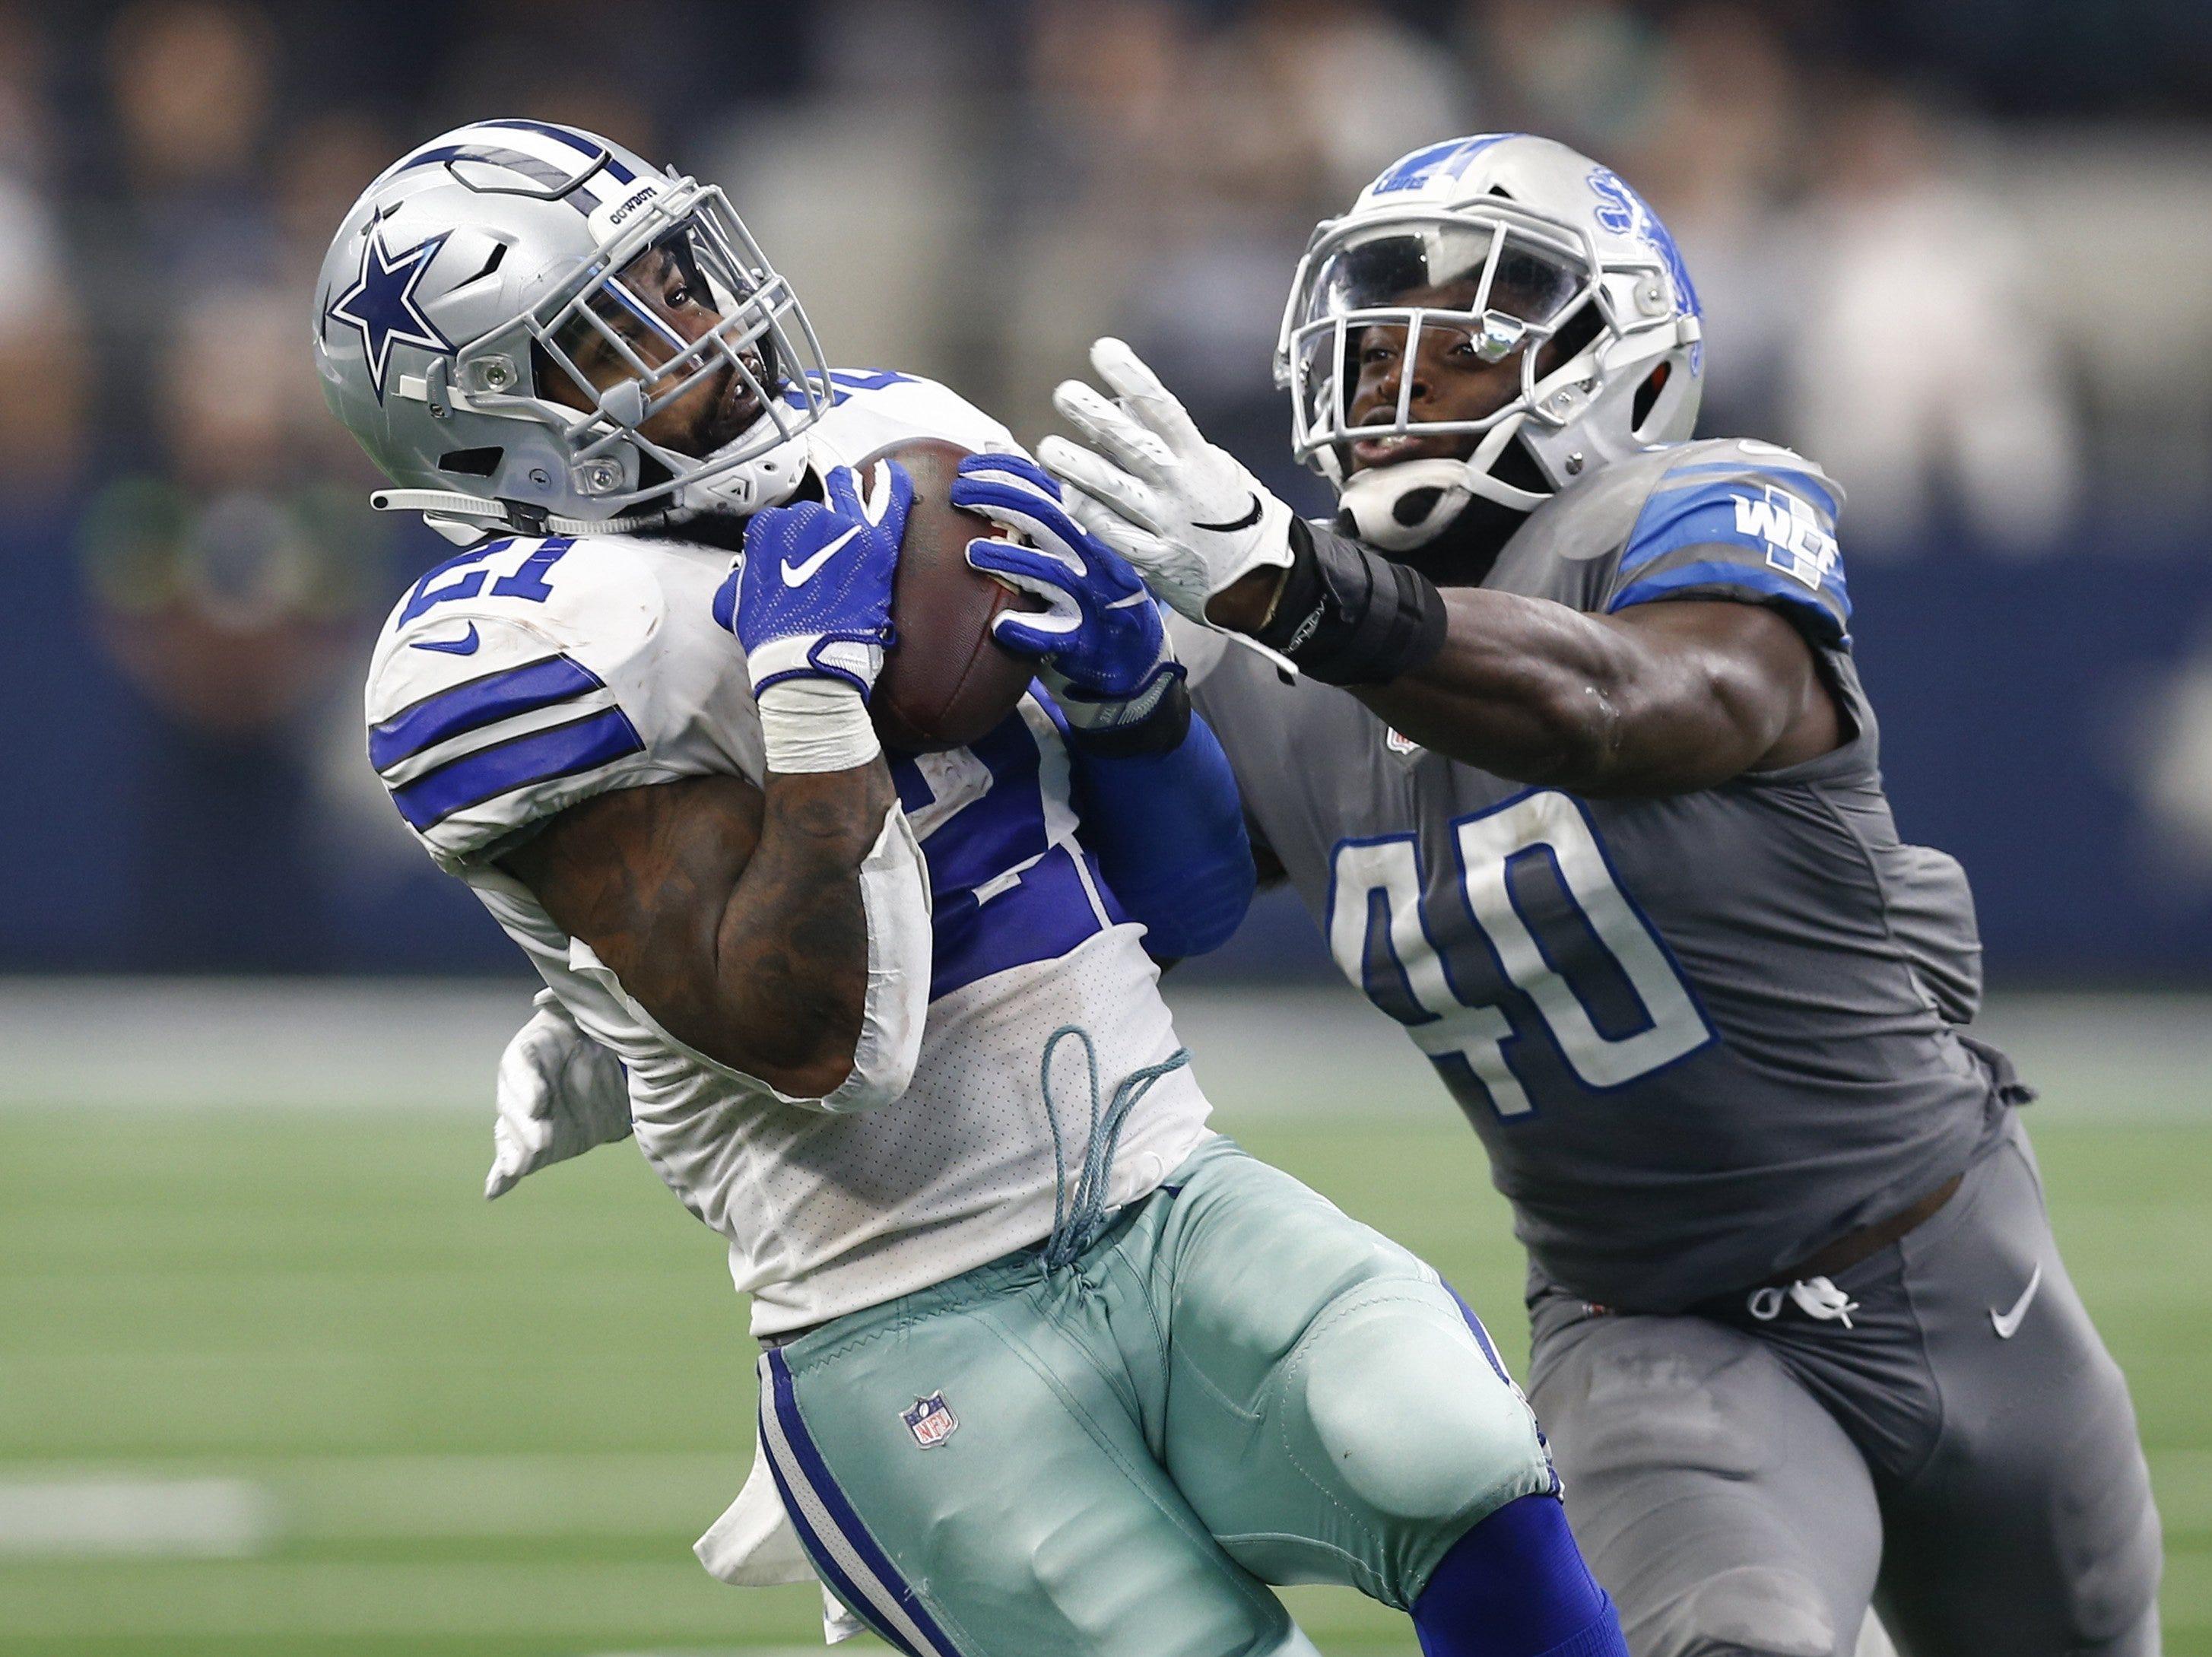 Cowboys running back Ezekiel Elliott hauls in a pass in front of Lions linebacker Jarrad Davis in the fourth quarter of the Lions' 26-24 loss on Sunday, Sept. 30, 2018, in Arlington, Texas.